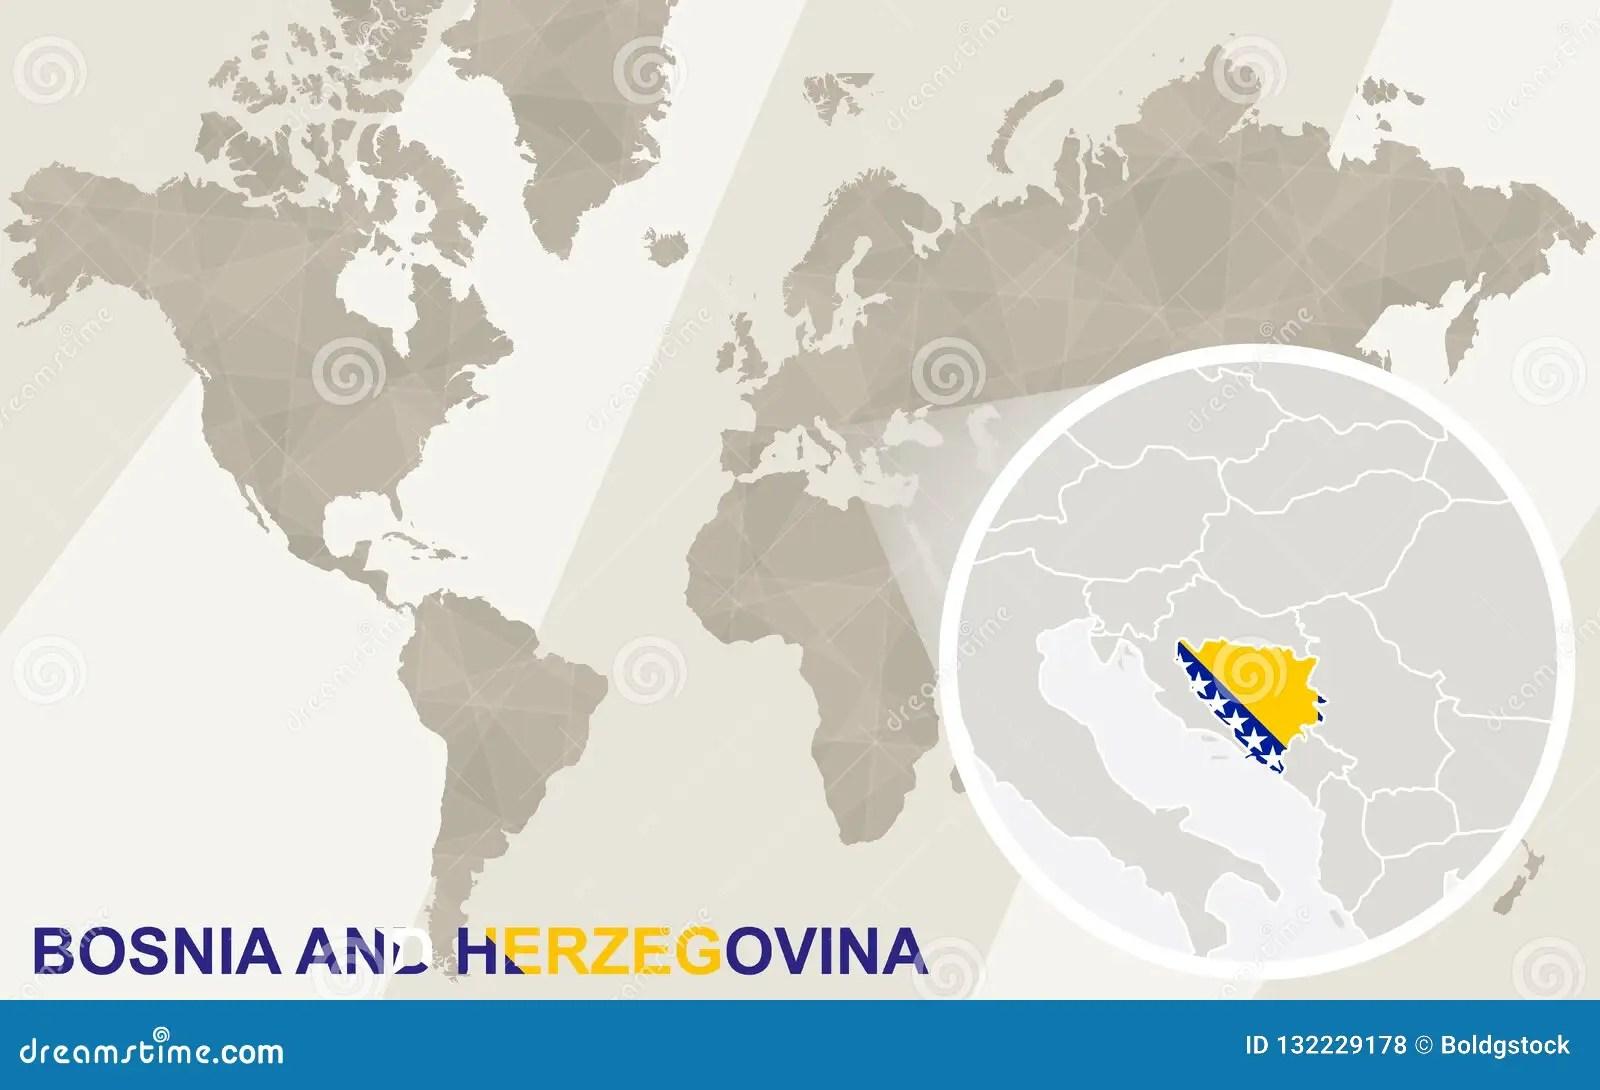 Zoom On Bosnia And Herzegovina Map And Flag World Map Stock Vector Illustration Of Geometrical Flag 132229178